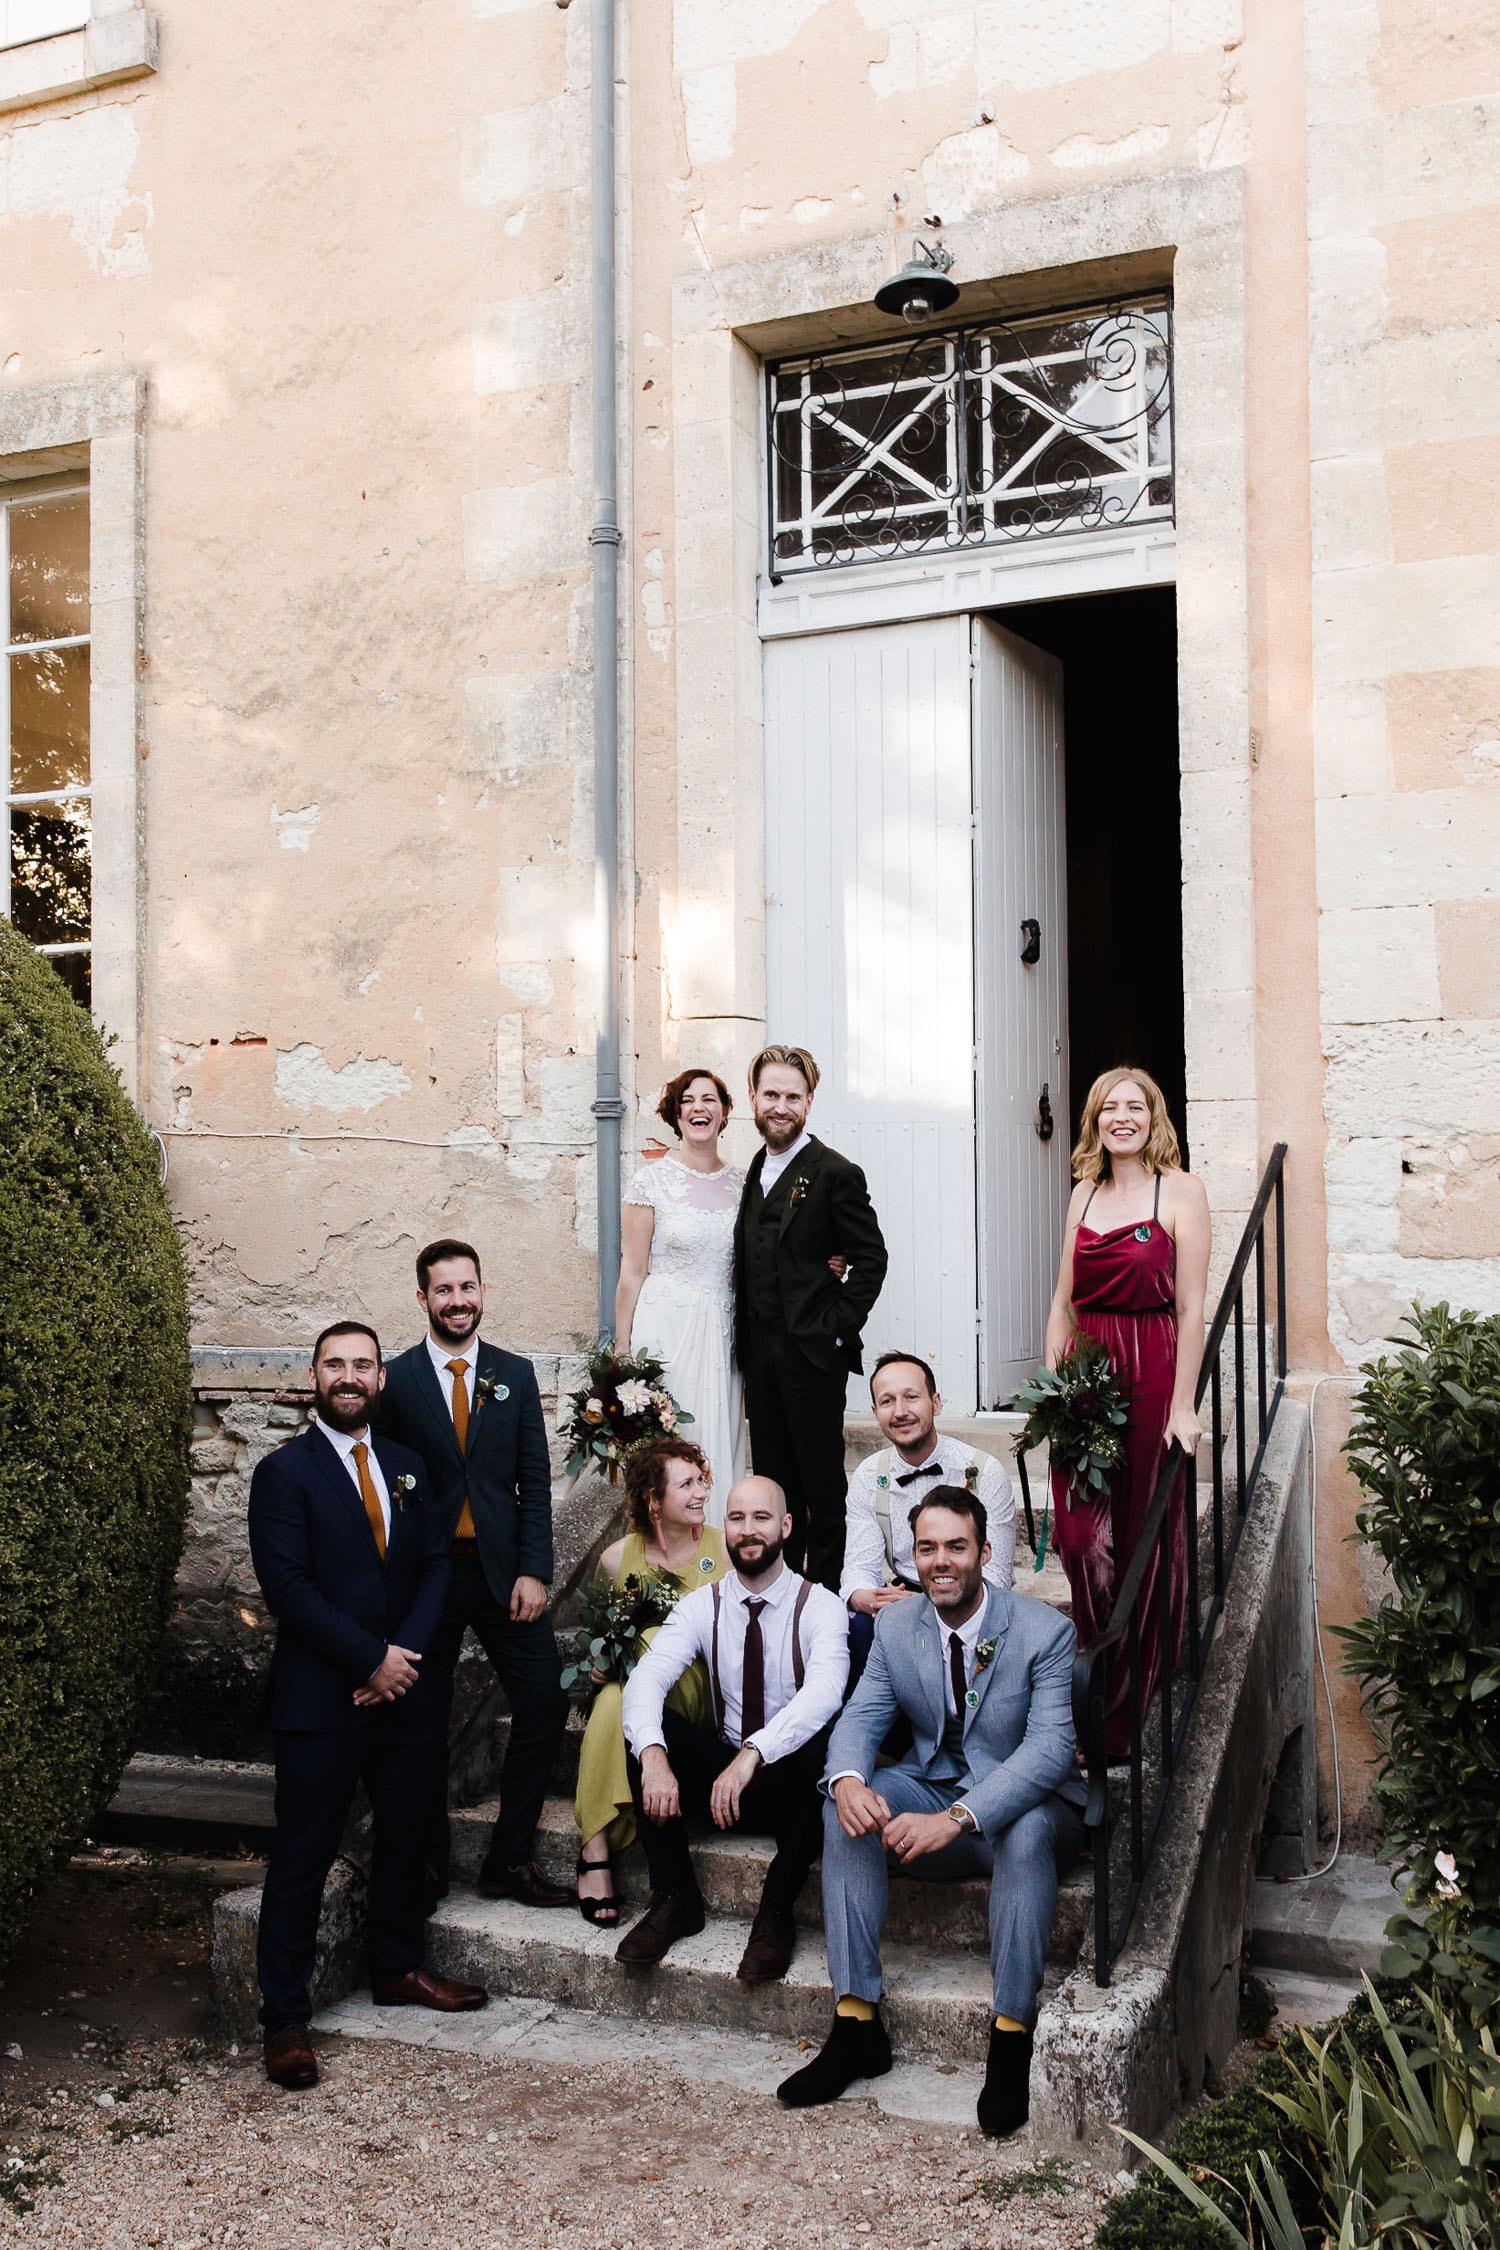 France-Destination-Wedding-Chateau-la-Blérétie-Best-Of-Holly-Jack-97.jpg